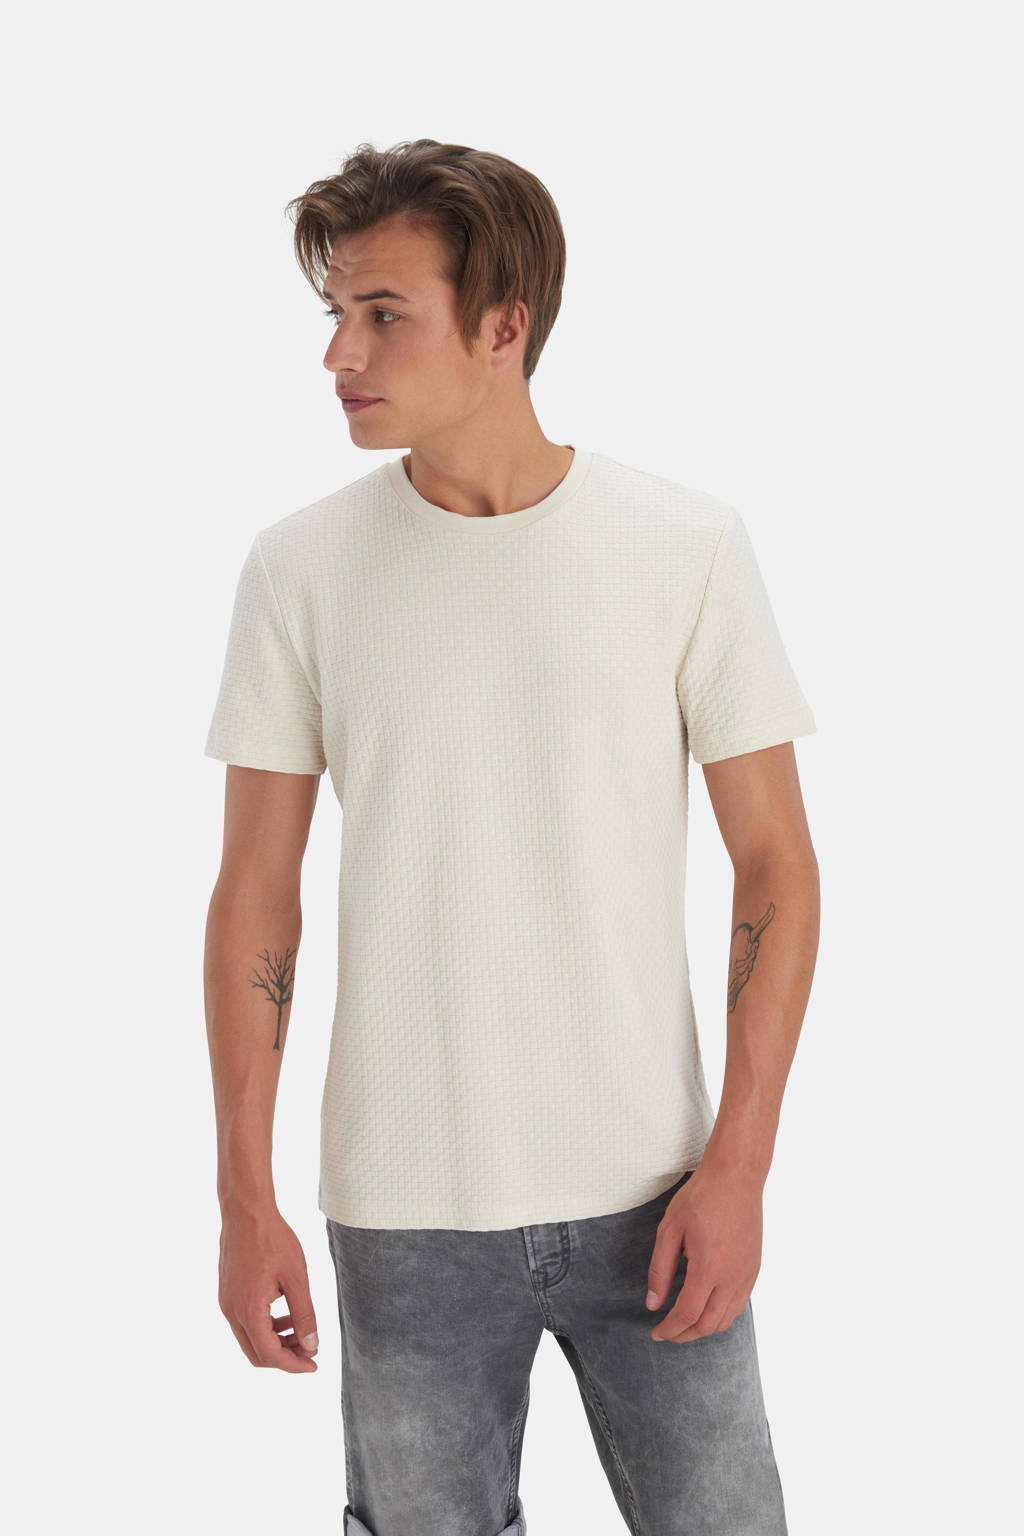 Refill by Shoeby T-shirt Terry met textuur zand, Zand